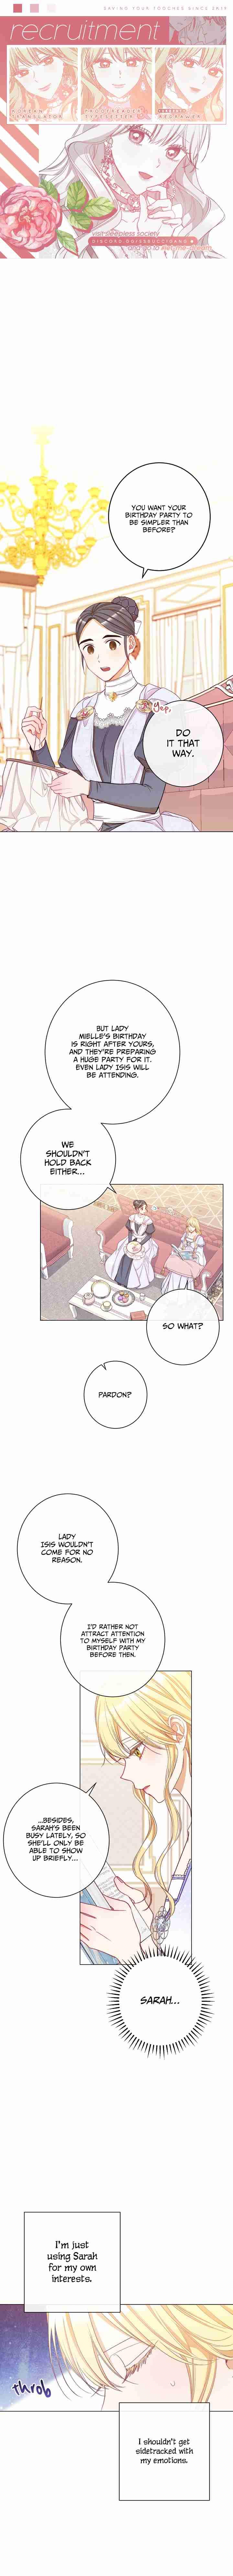 https://manga.mangadogs.com/comics/pic4/51/35315/2143519/7357b0fb2ec0541b99592b5612f87b92.jpg Page 1